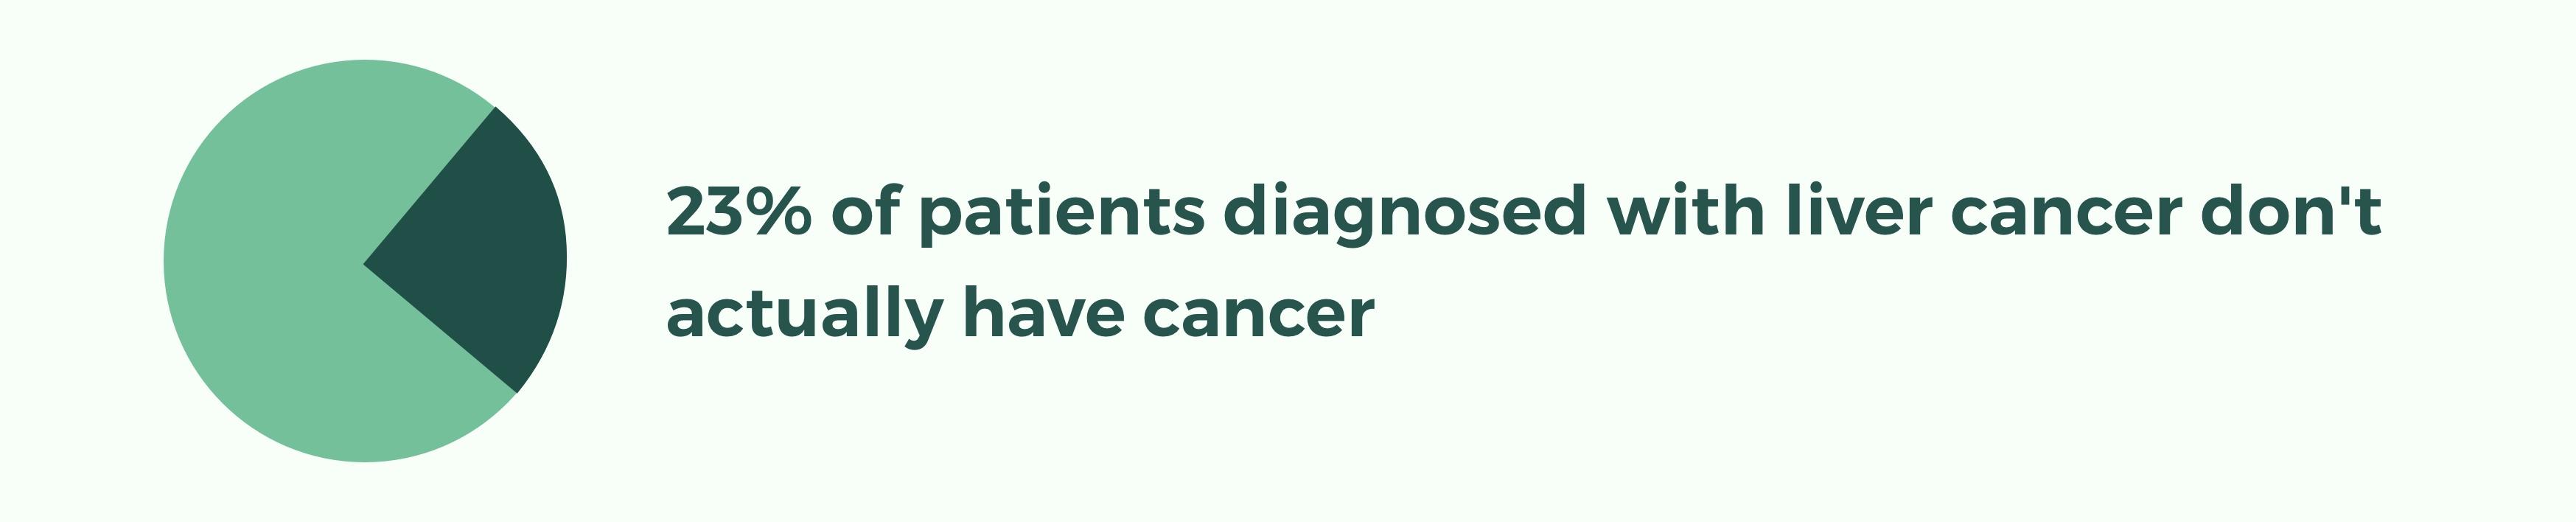 livercancer-misdiagnosis.jpg